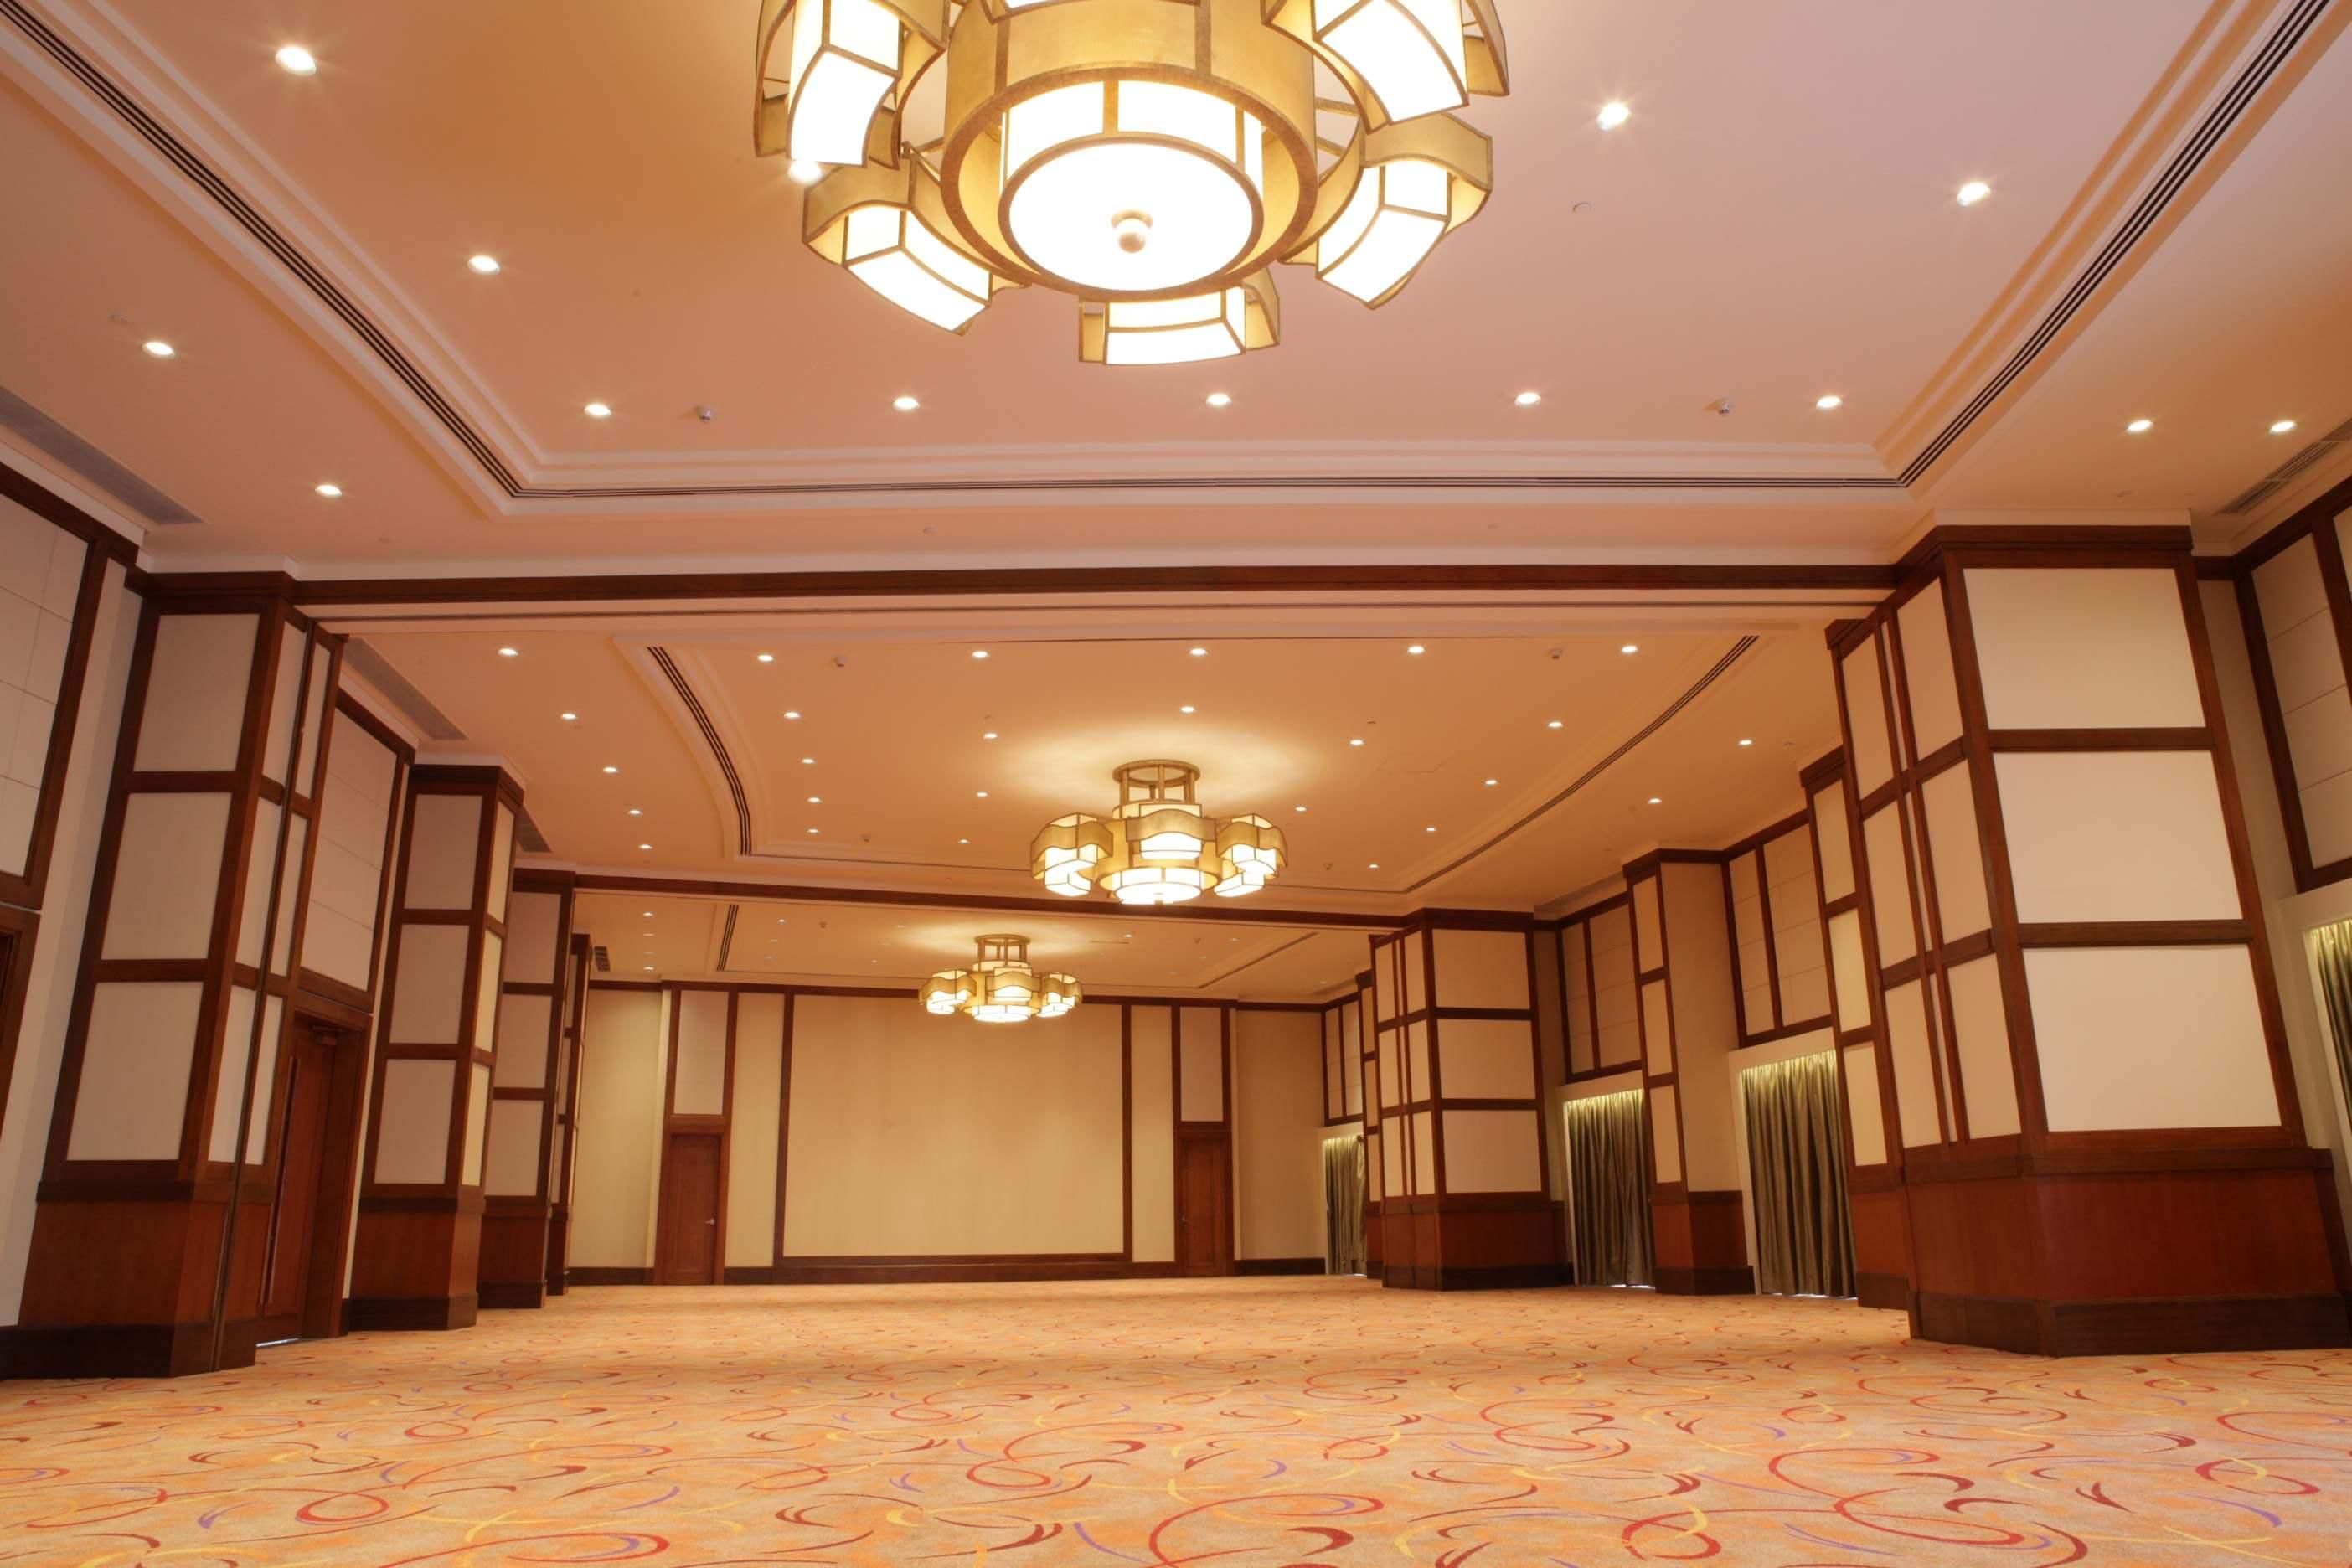 Insular life makati ballroom 2x